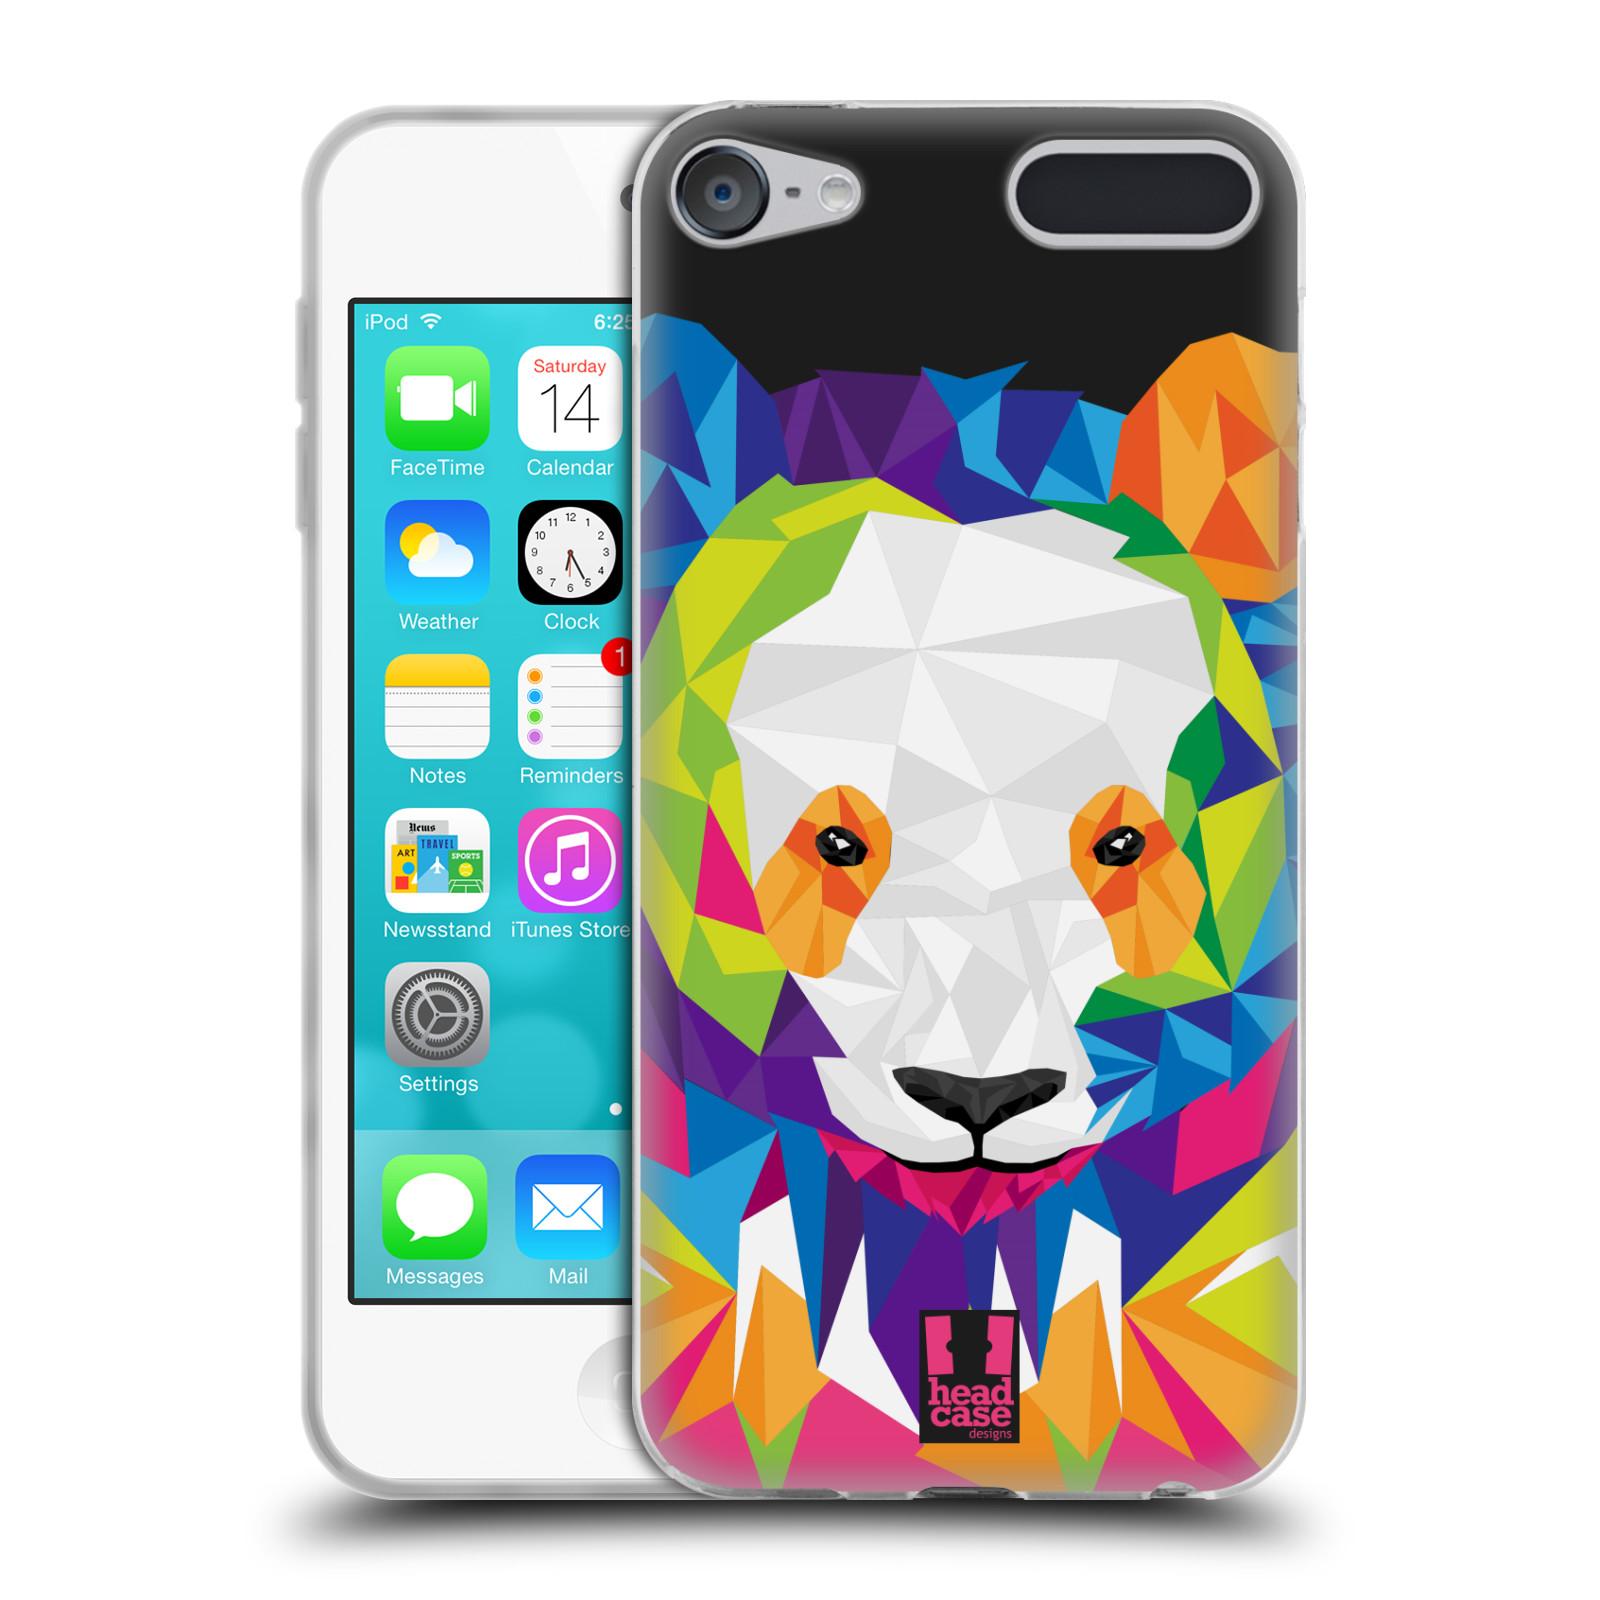 Case Of Squishy Pops : HEAD CASE DESIGNS POP ART ANIMALS SOFT GEL CASE FOR APPLE iPOD TOUCH MP3 eBay